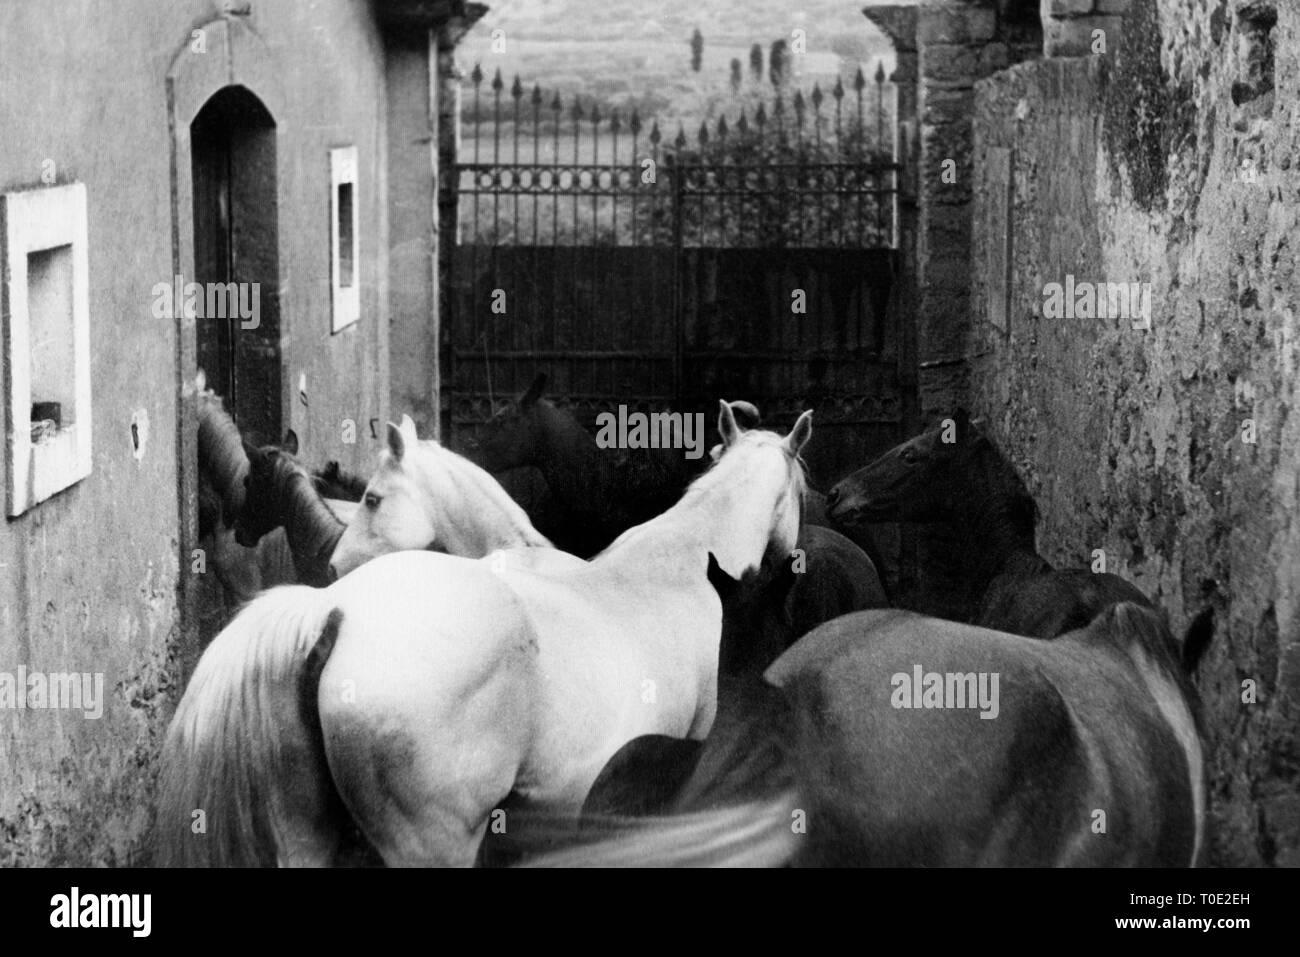 horse breeding, caltagirone, sicily, italy 1920 1930 - Stock Image